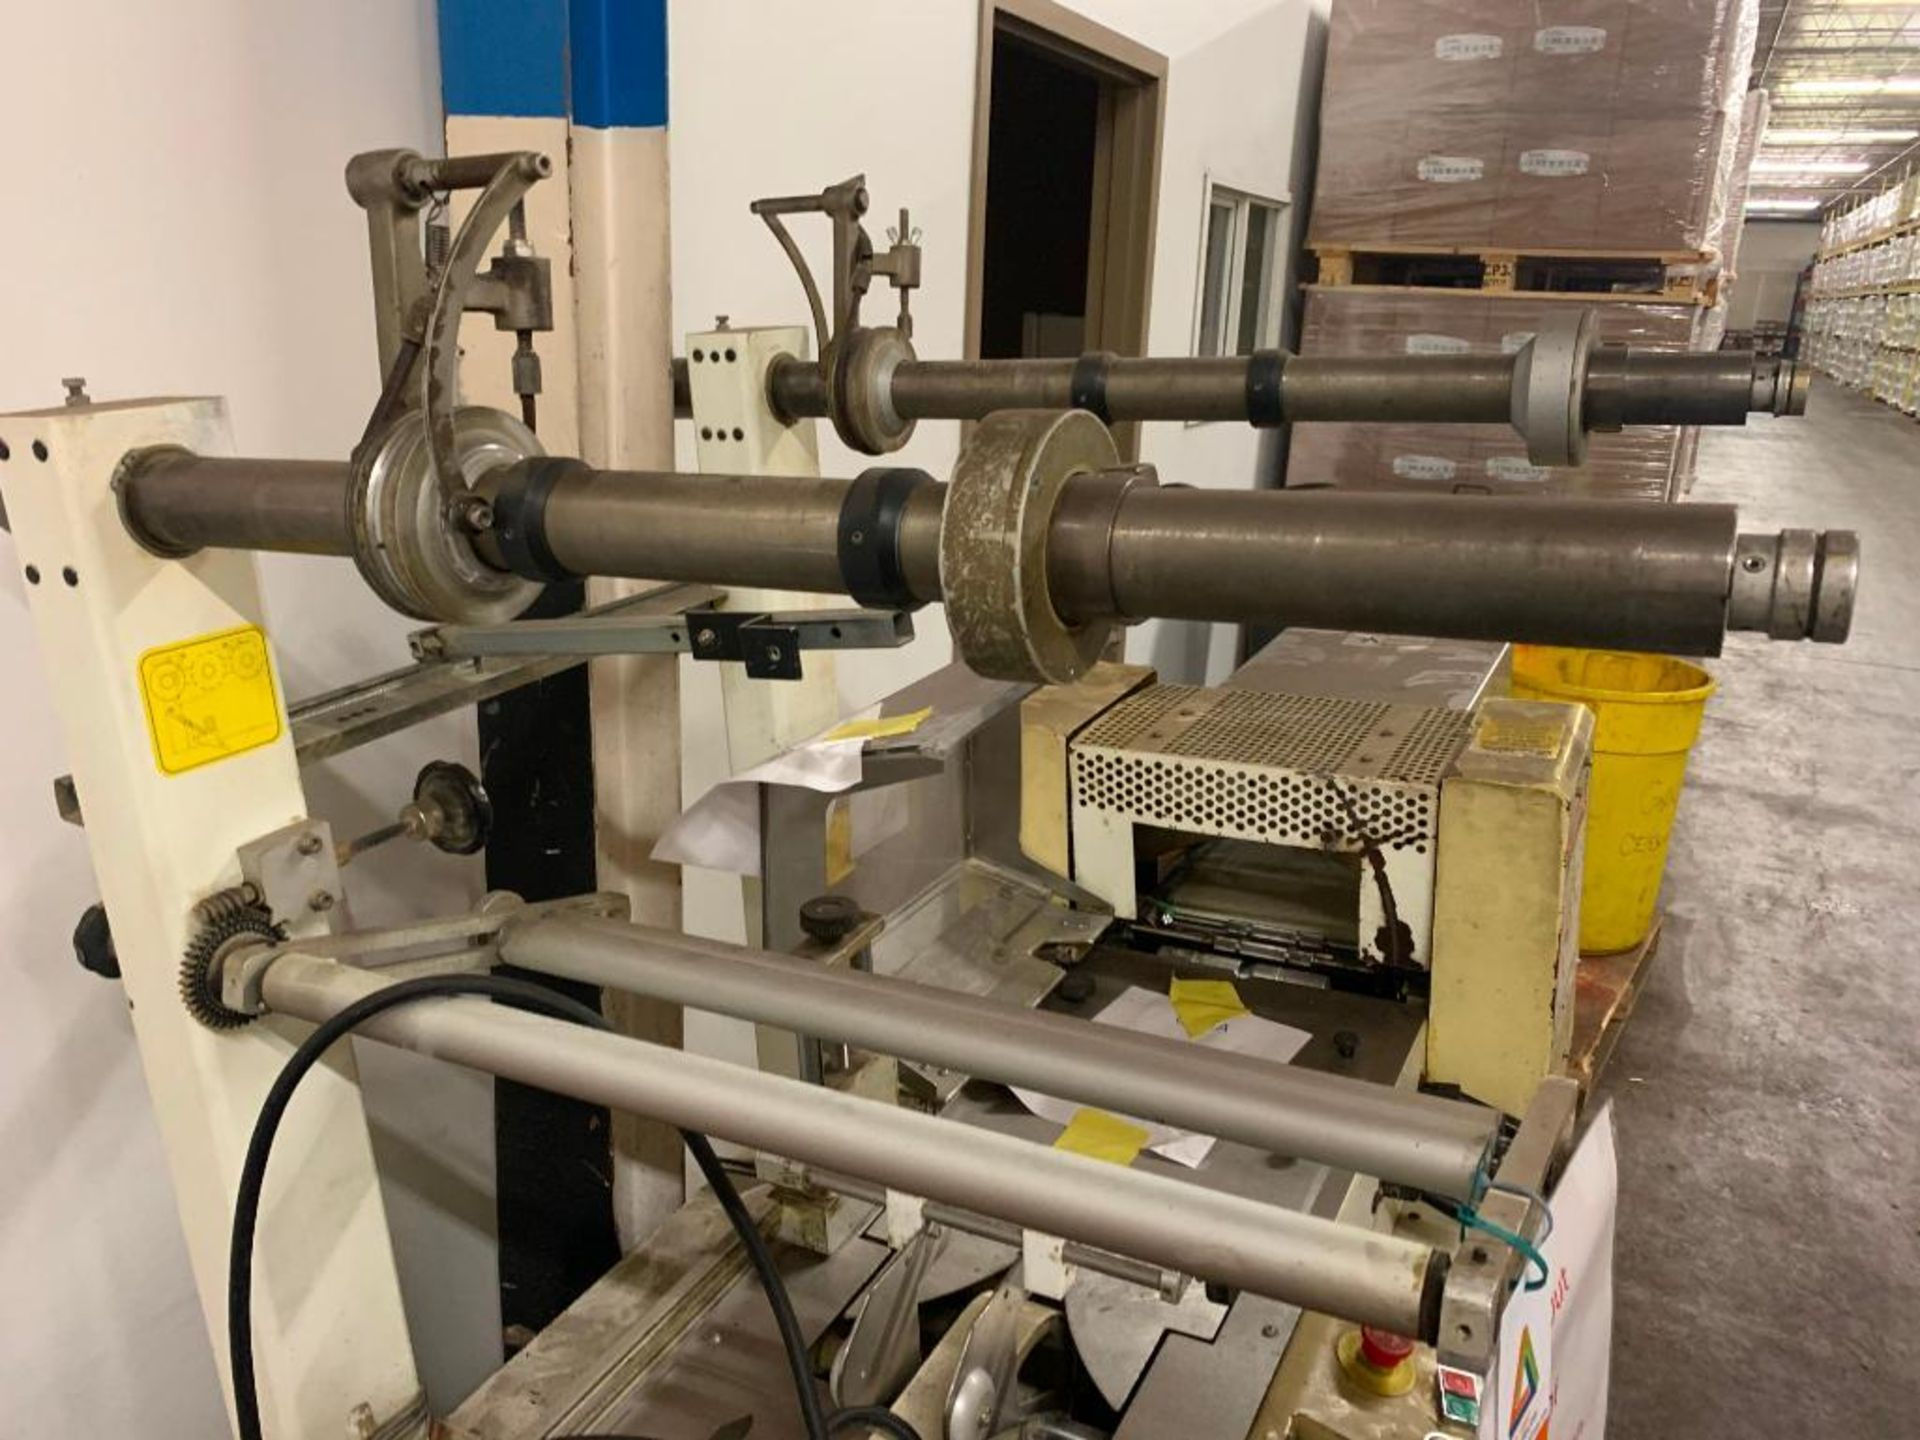 Ulma horizontal flow wrapper, model BD-20 - Image 2 of 5